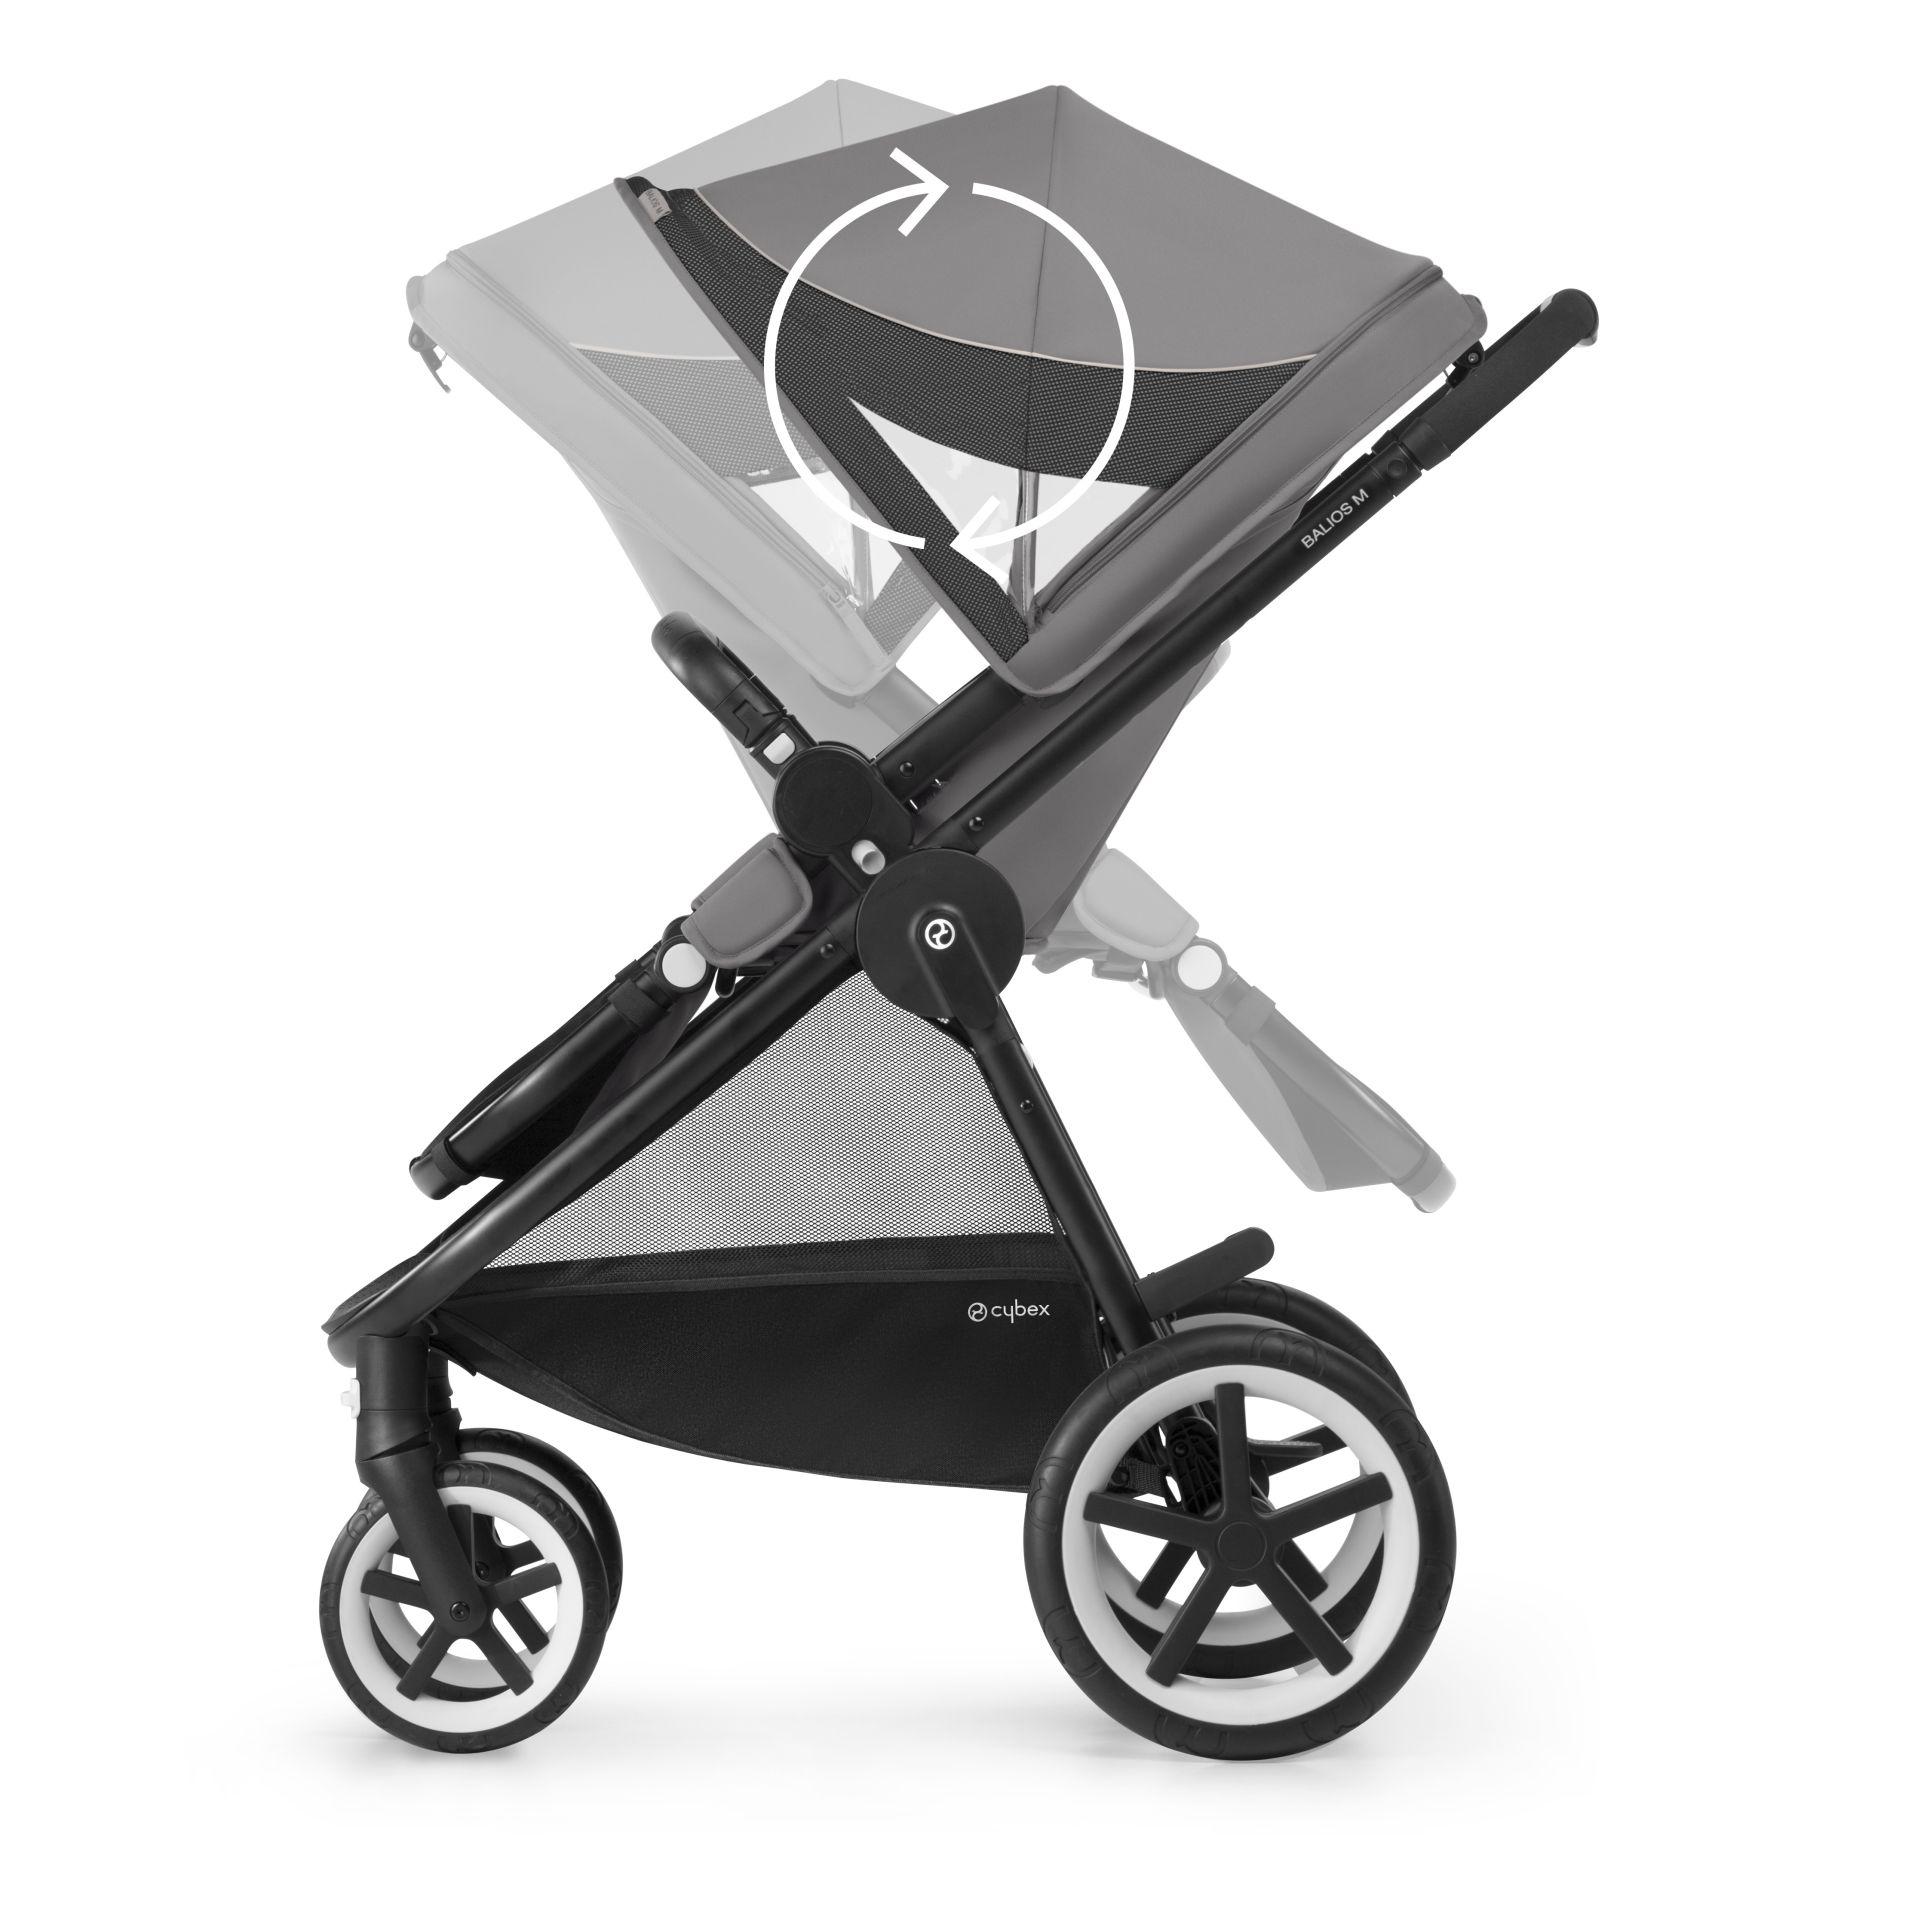 cybex stroller balios m 2018 manhattan grey mid grey buy at kidsroom strollers. Black Bedroom Furniture Sets. Home Design Ideas